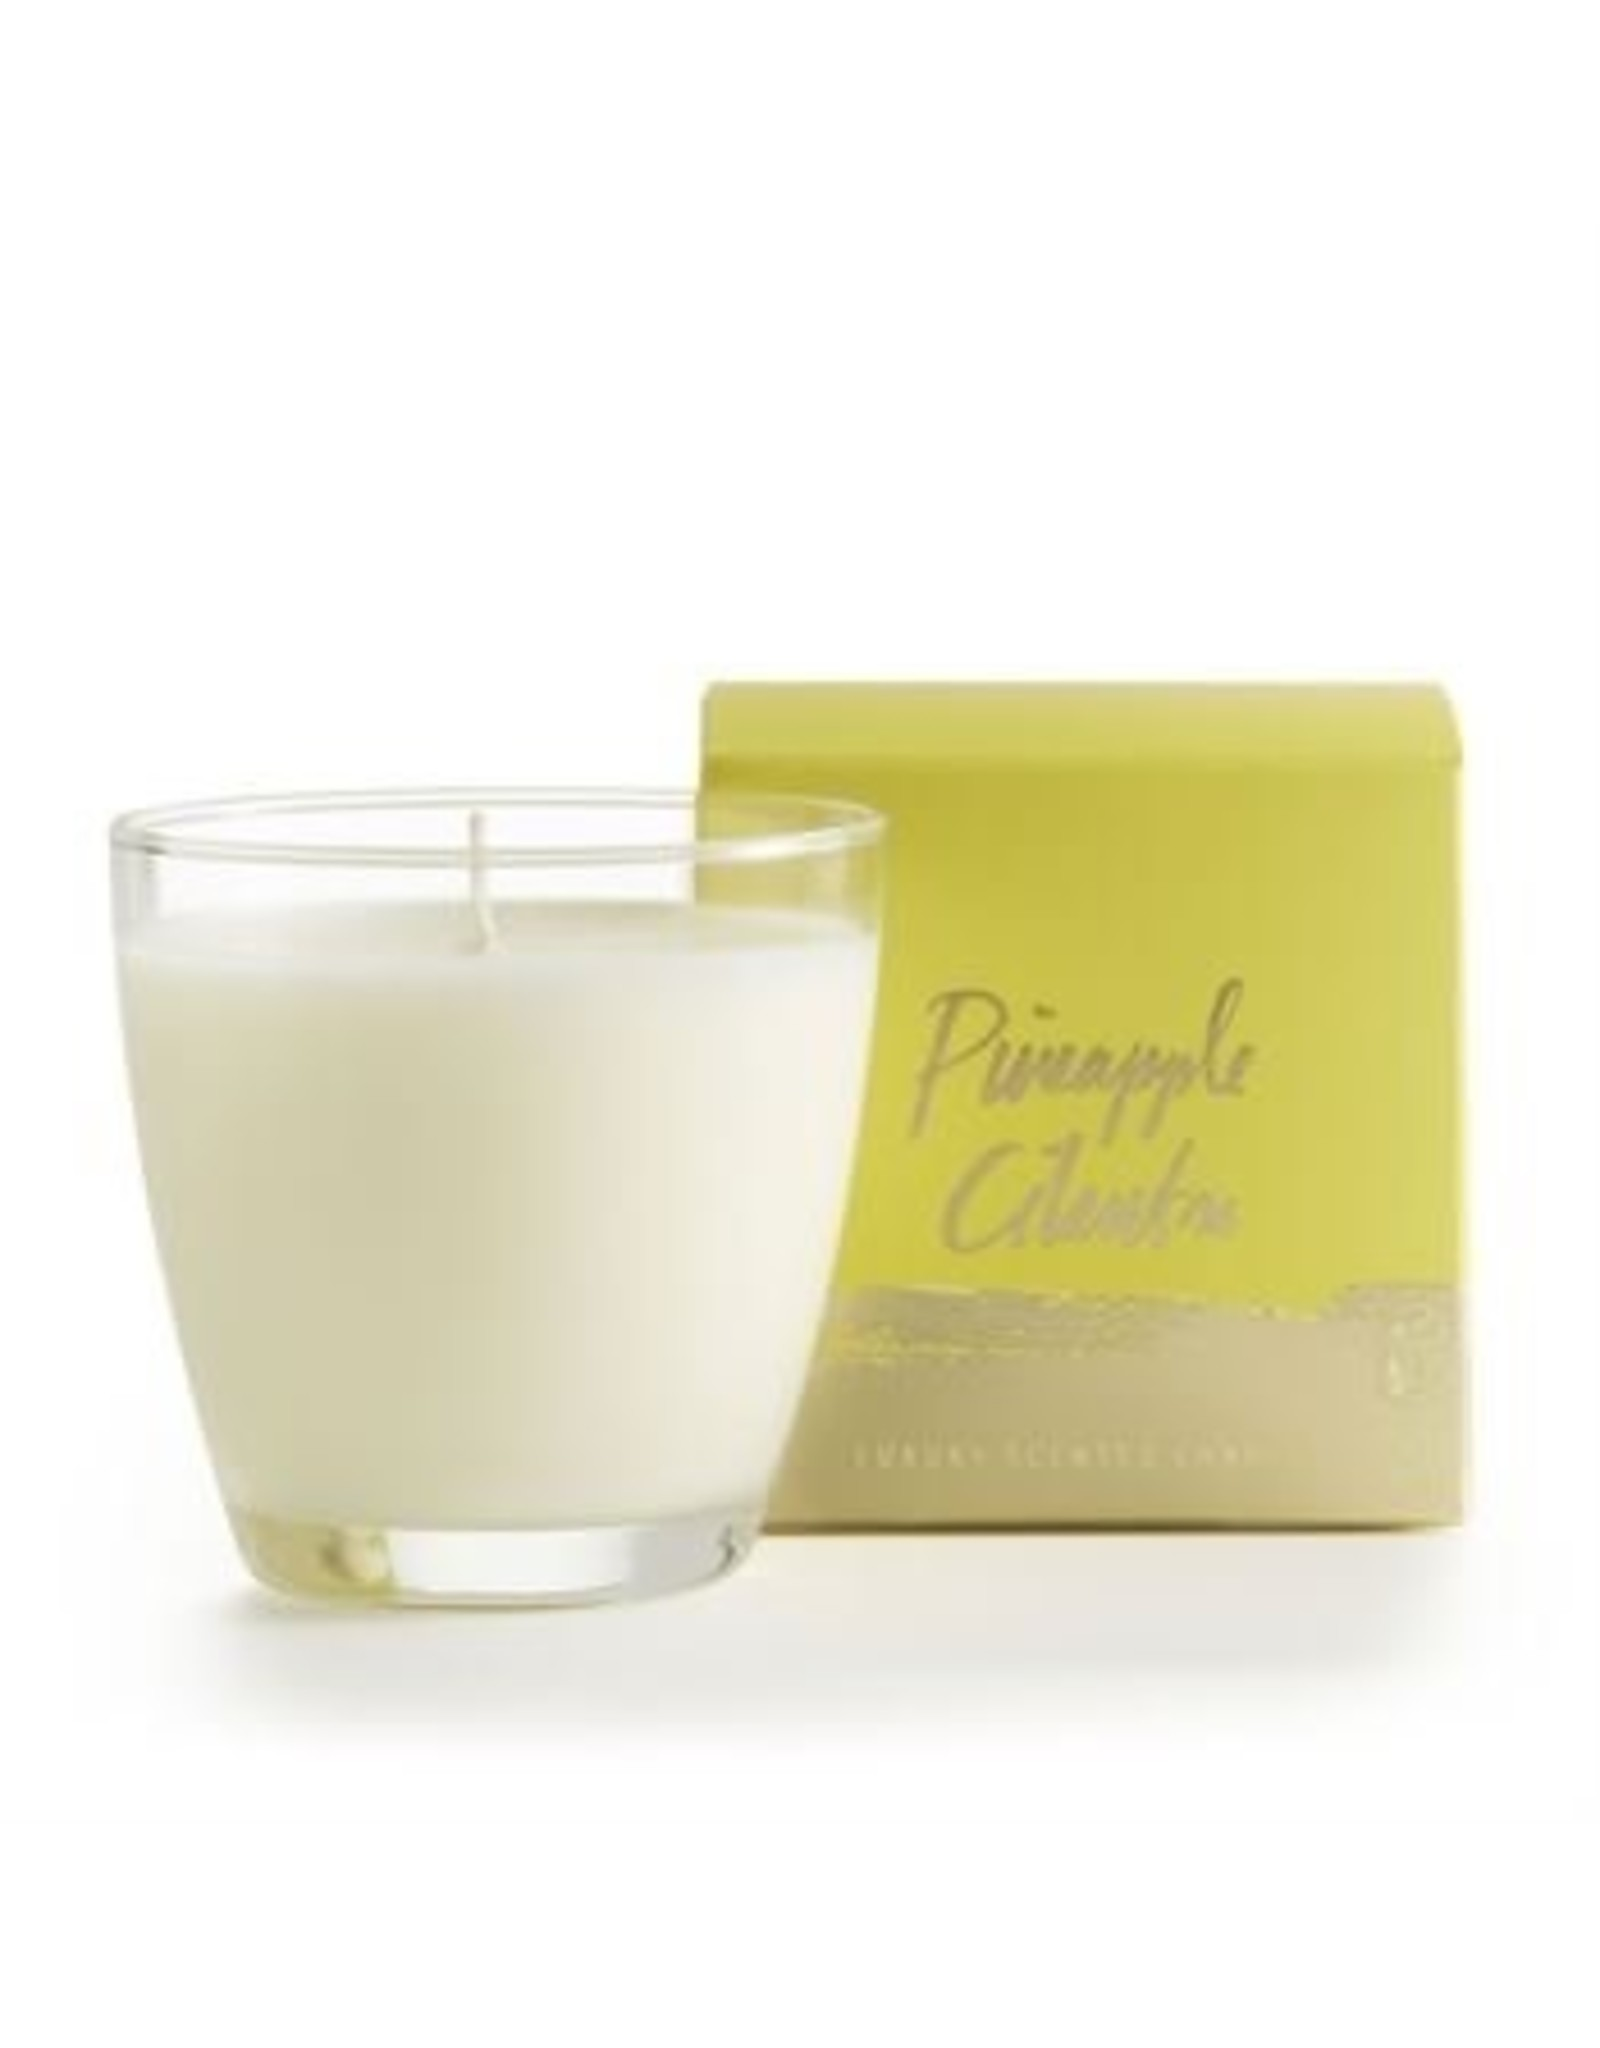 Illume Pineapple Cilantro Glass Candle - 4.7oz